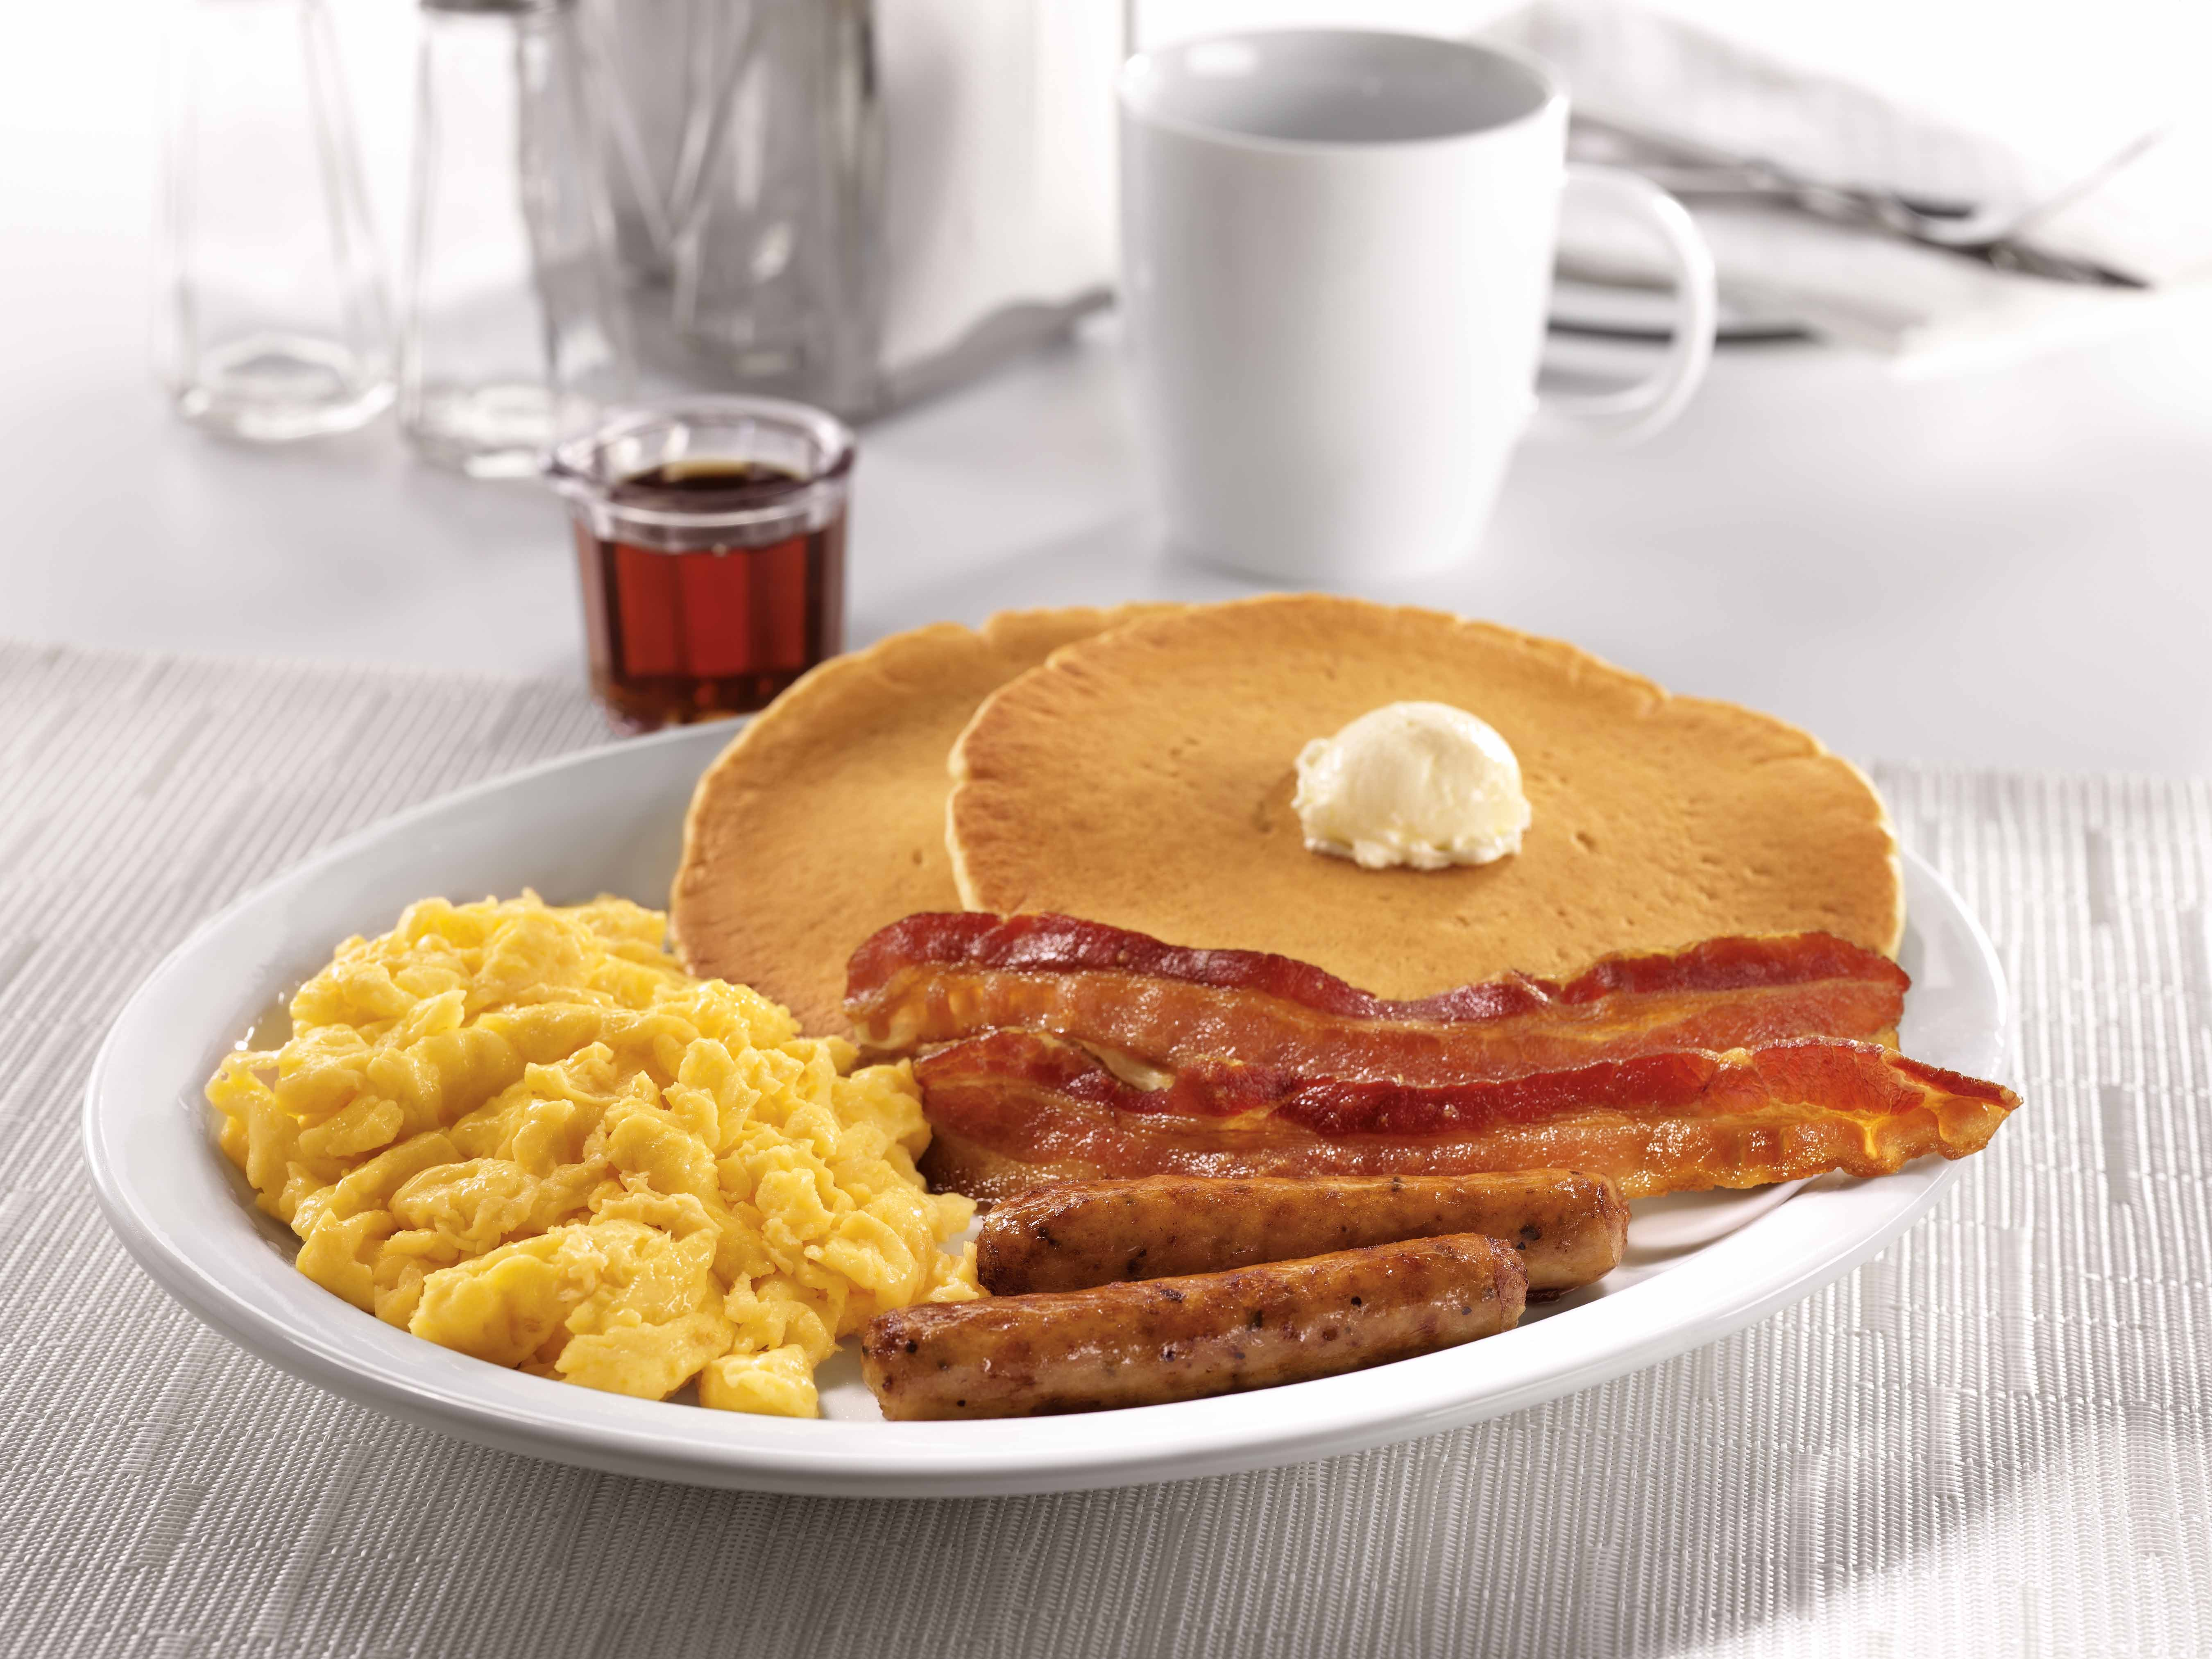 An image of Denny's  Grand Slam breakfast.